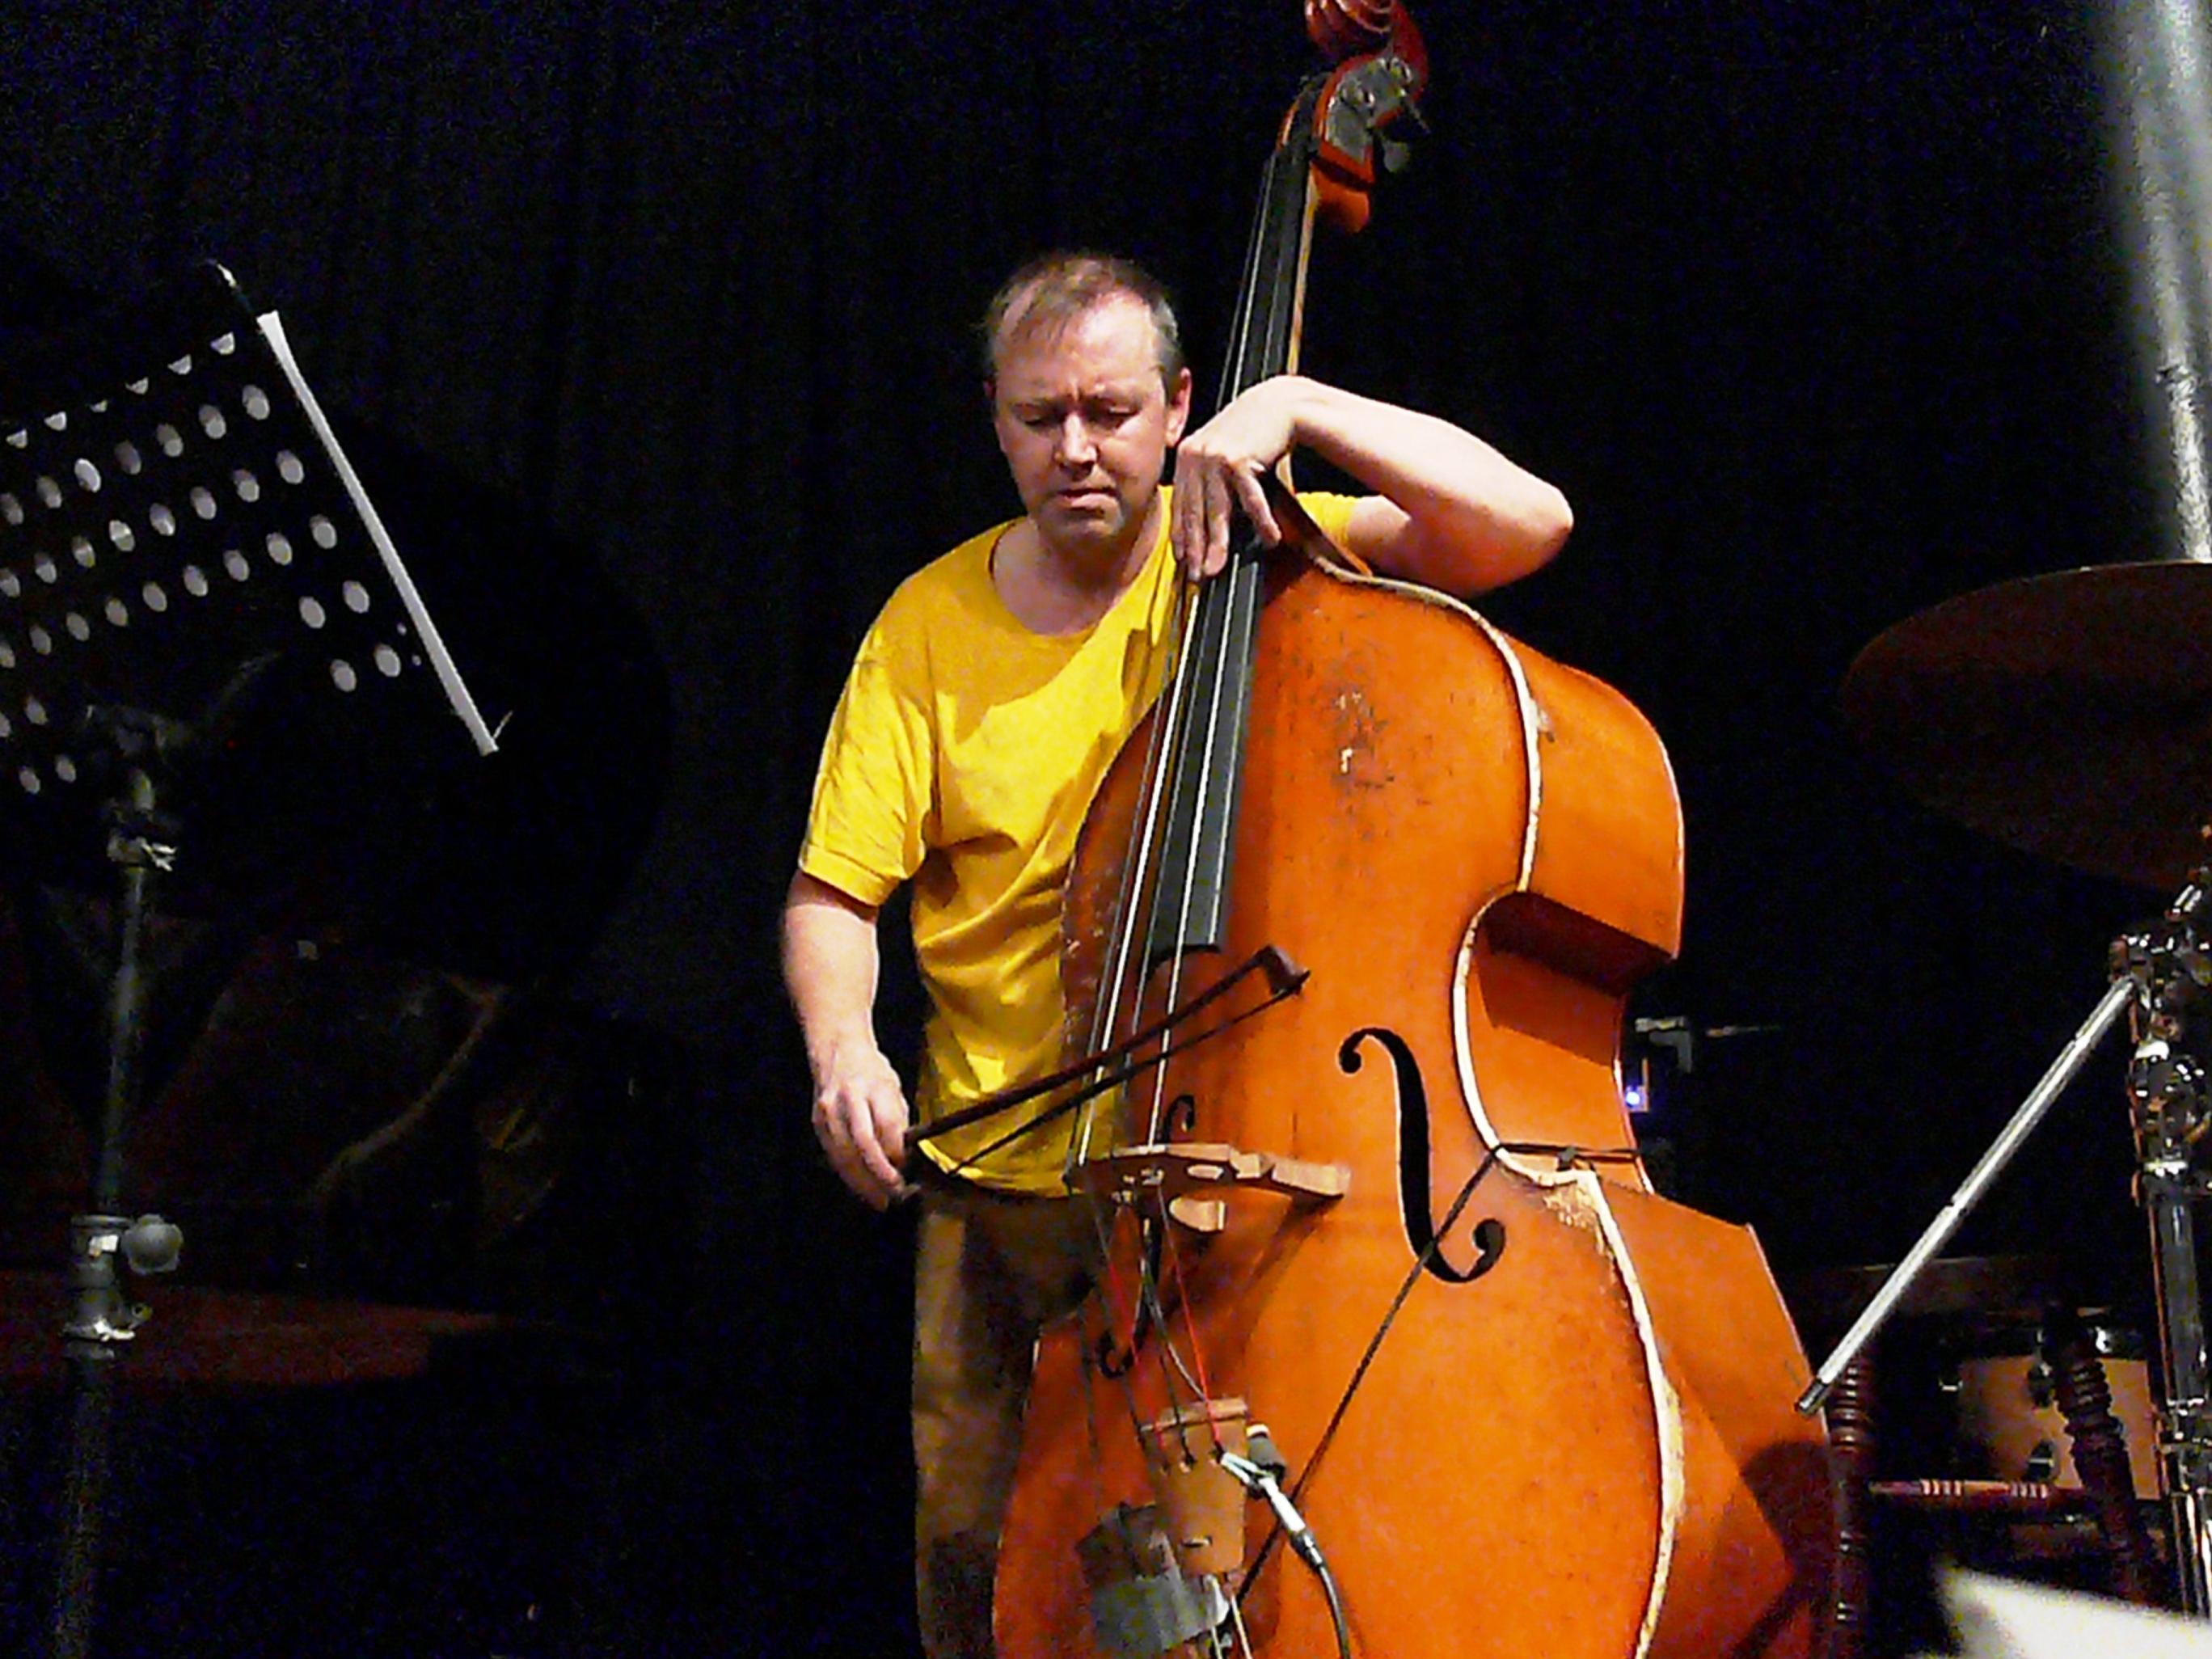 John edwards at the vortex, london in february 2013